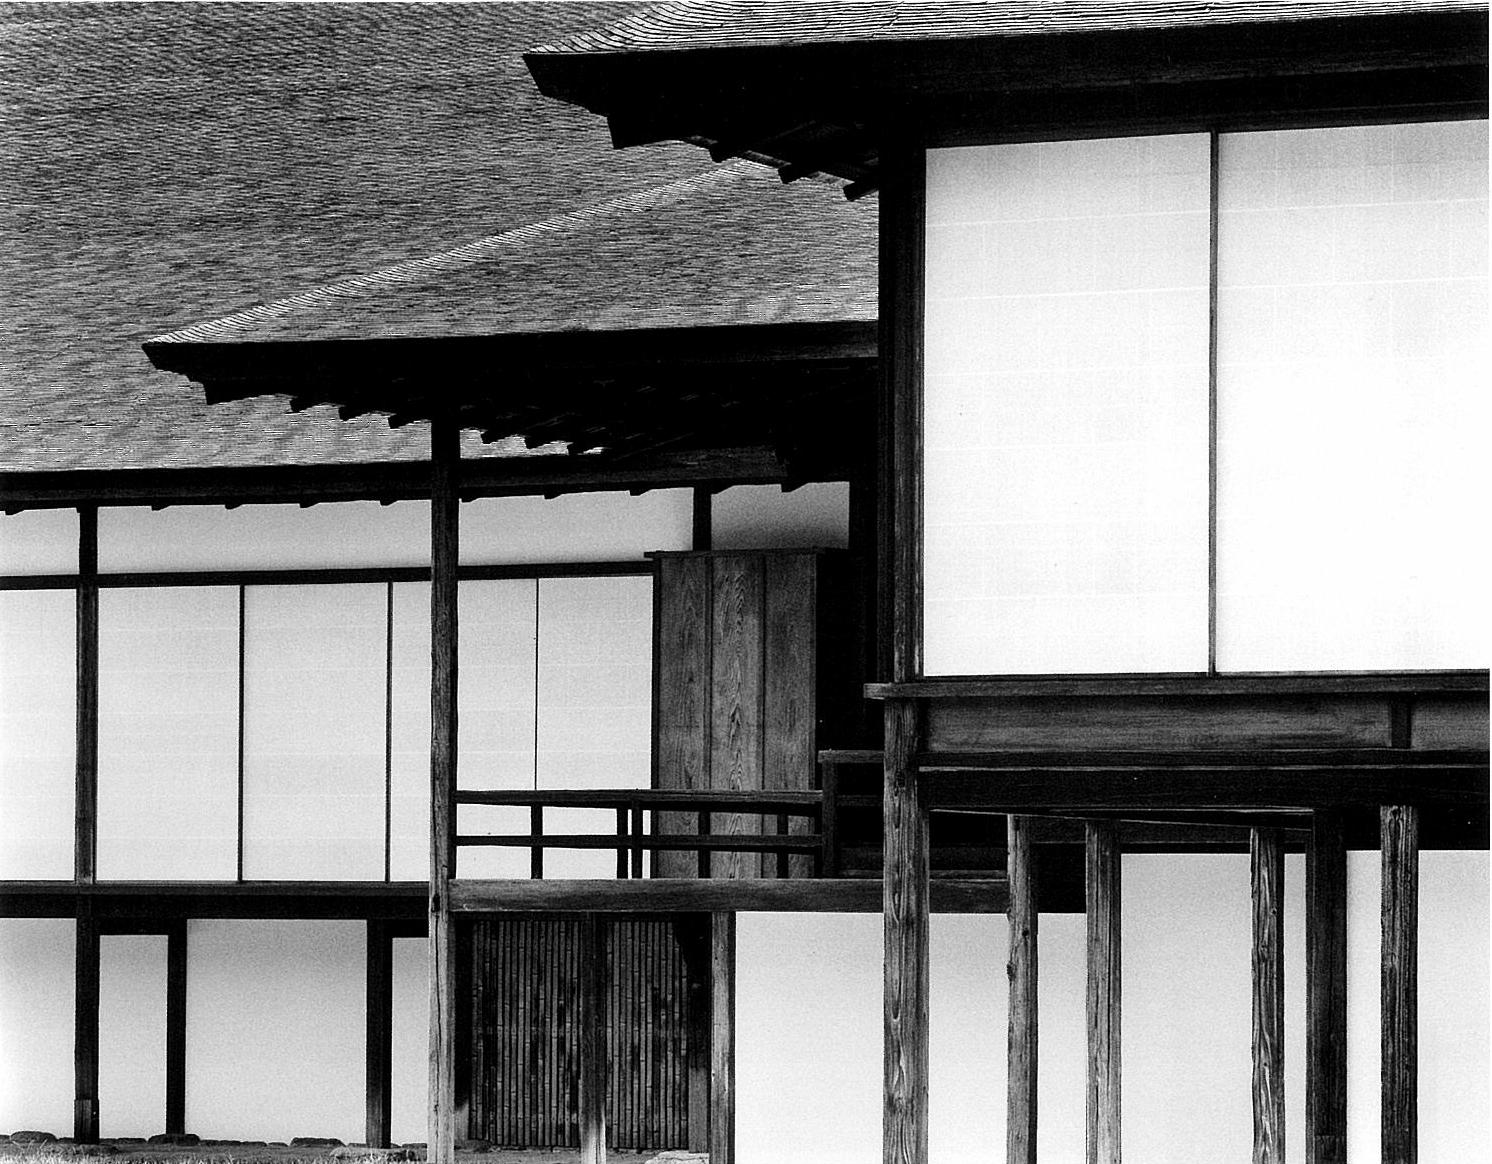 Kenzo Tange Katsura